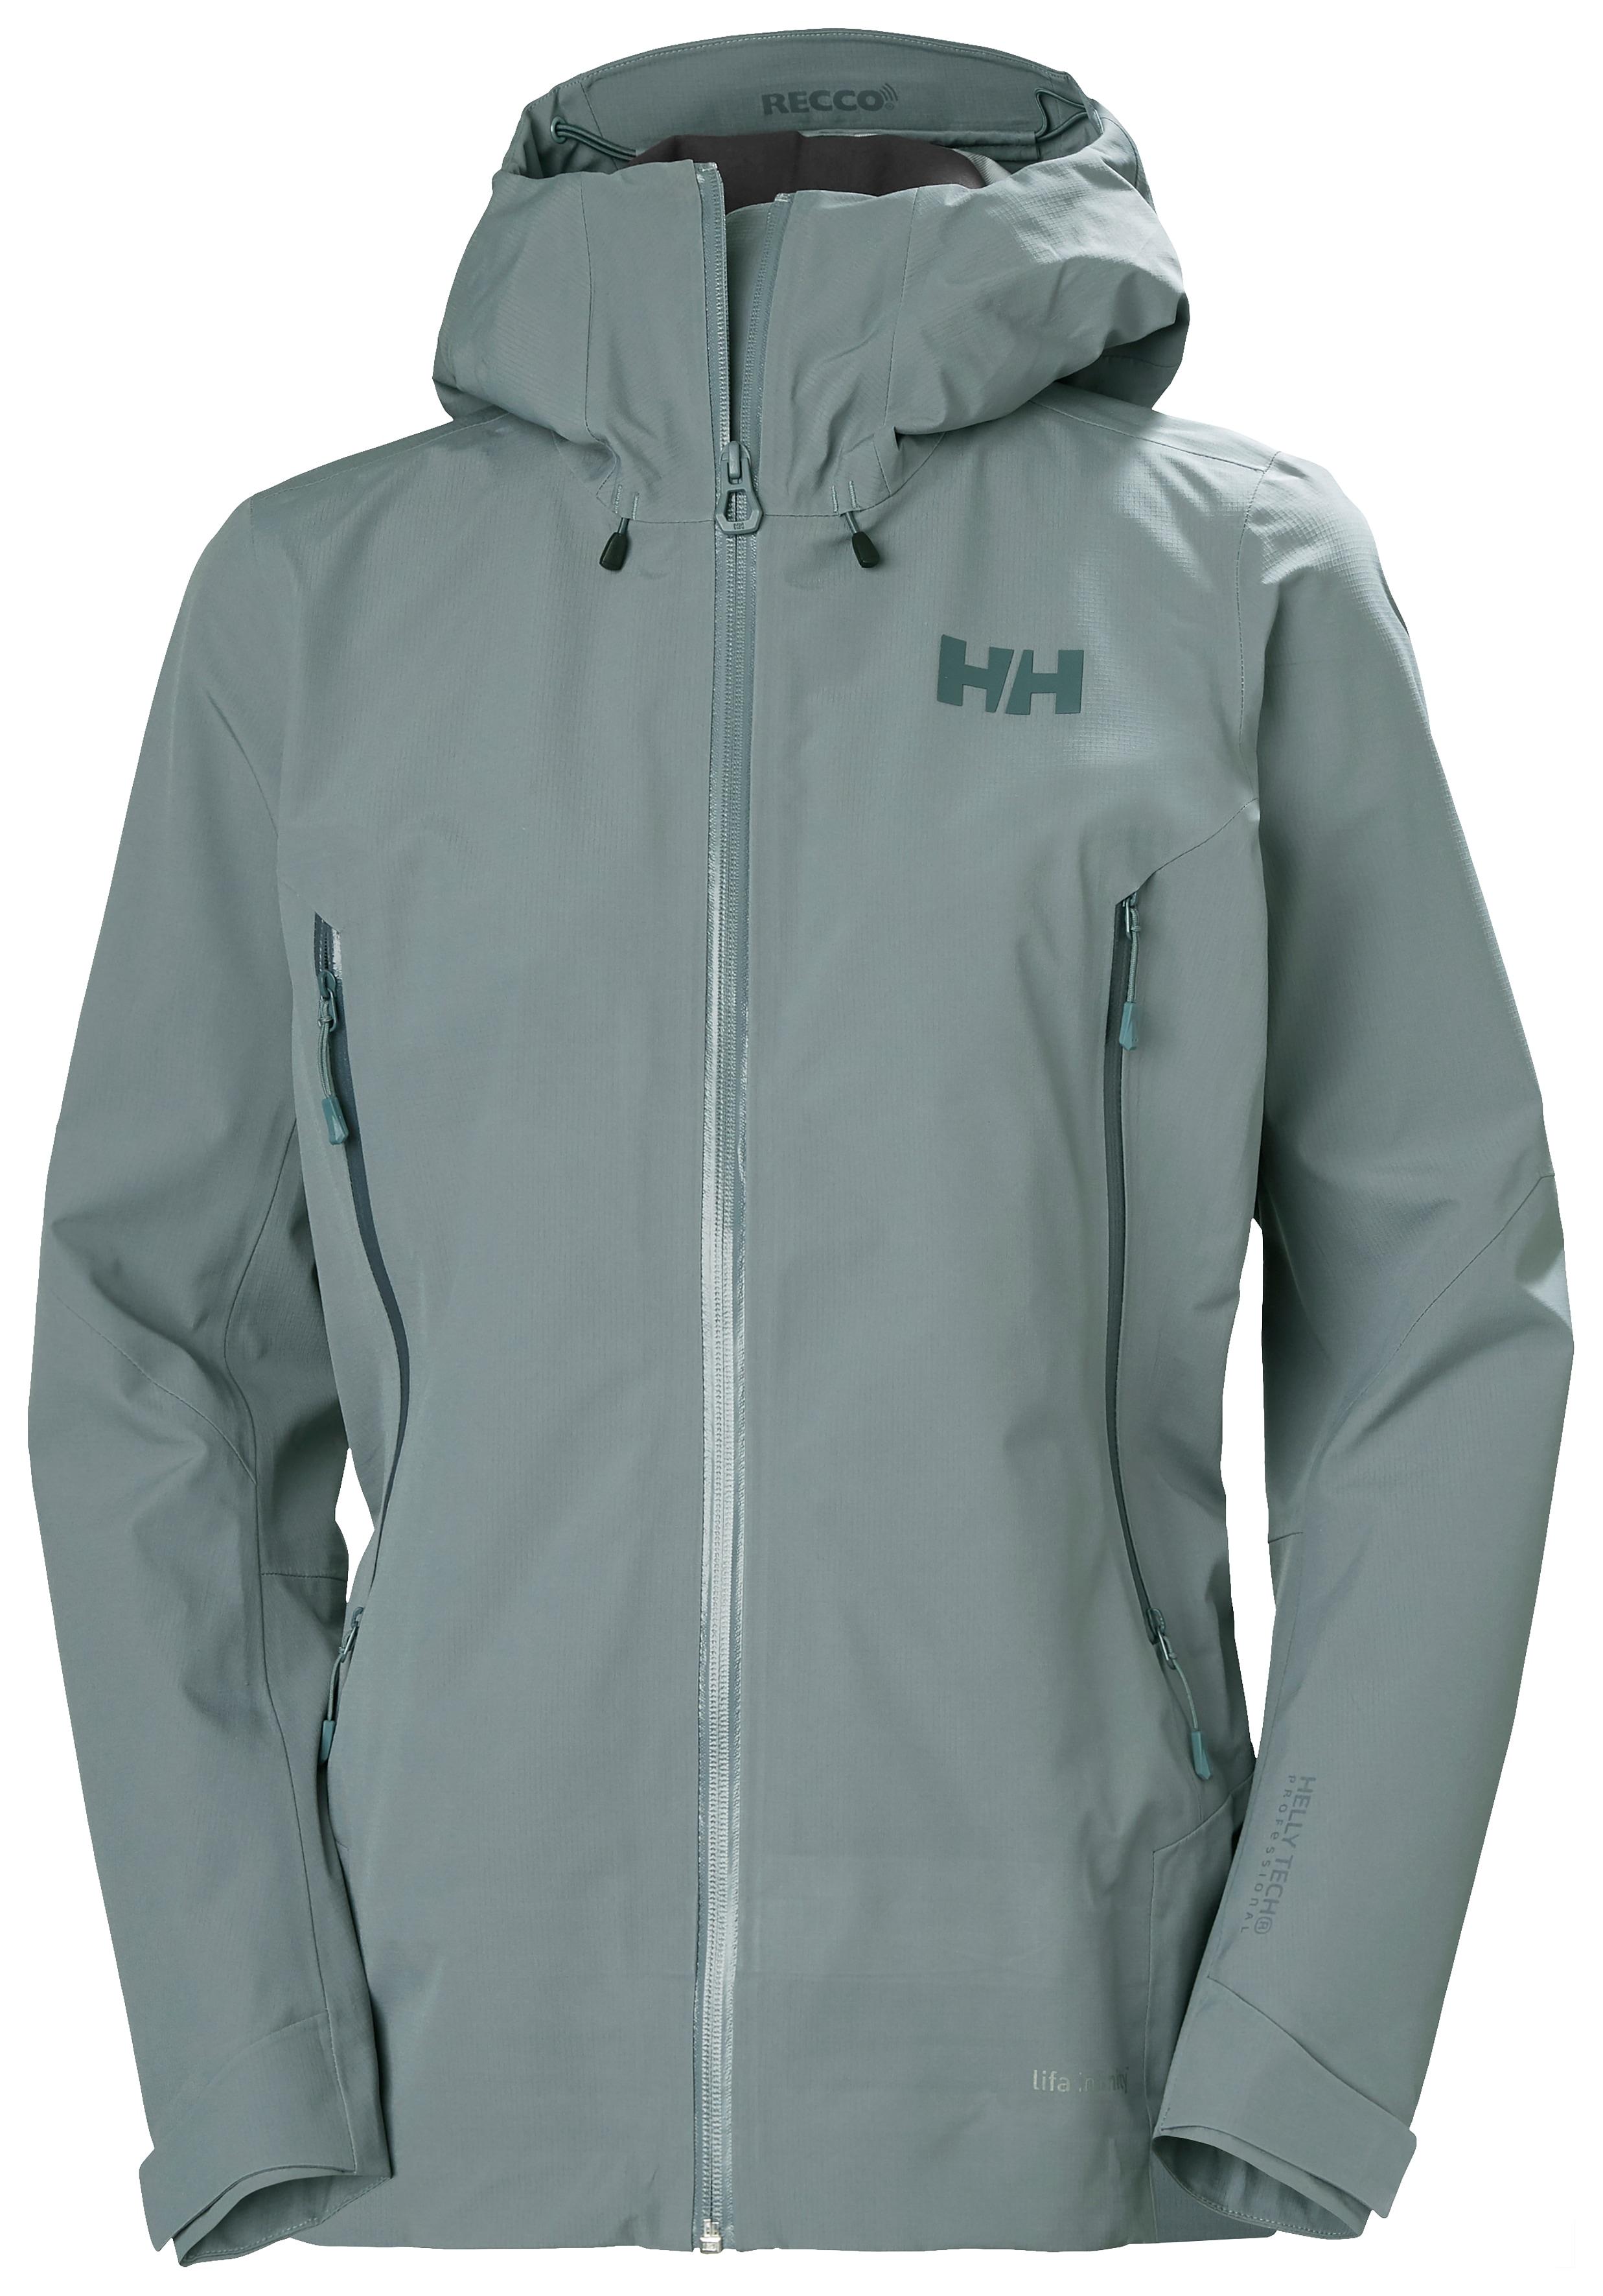 Helly Hansen Verglas Infinity Shell Jacket, W's